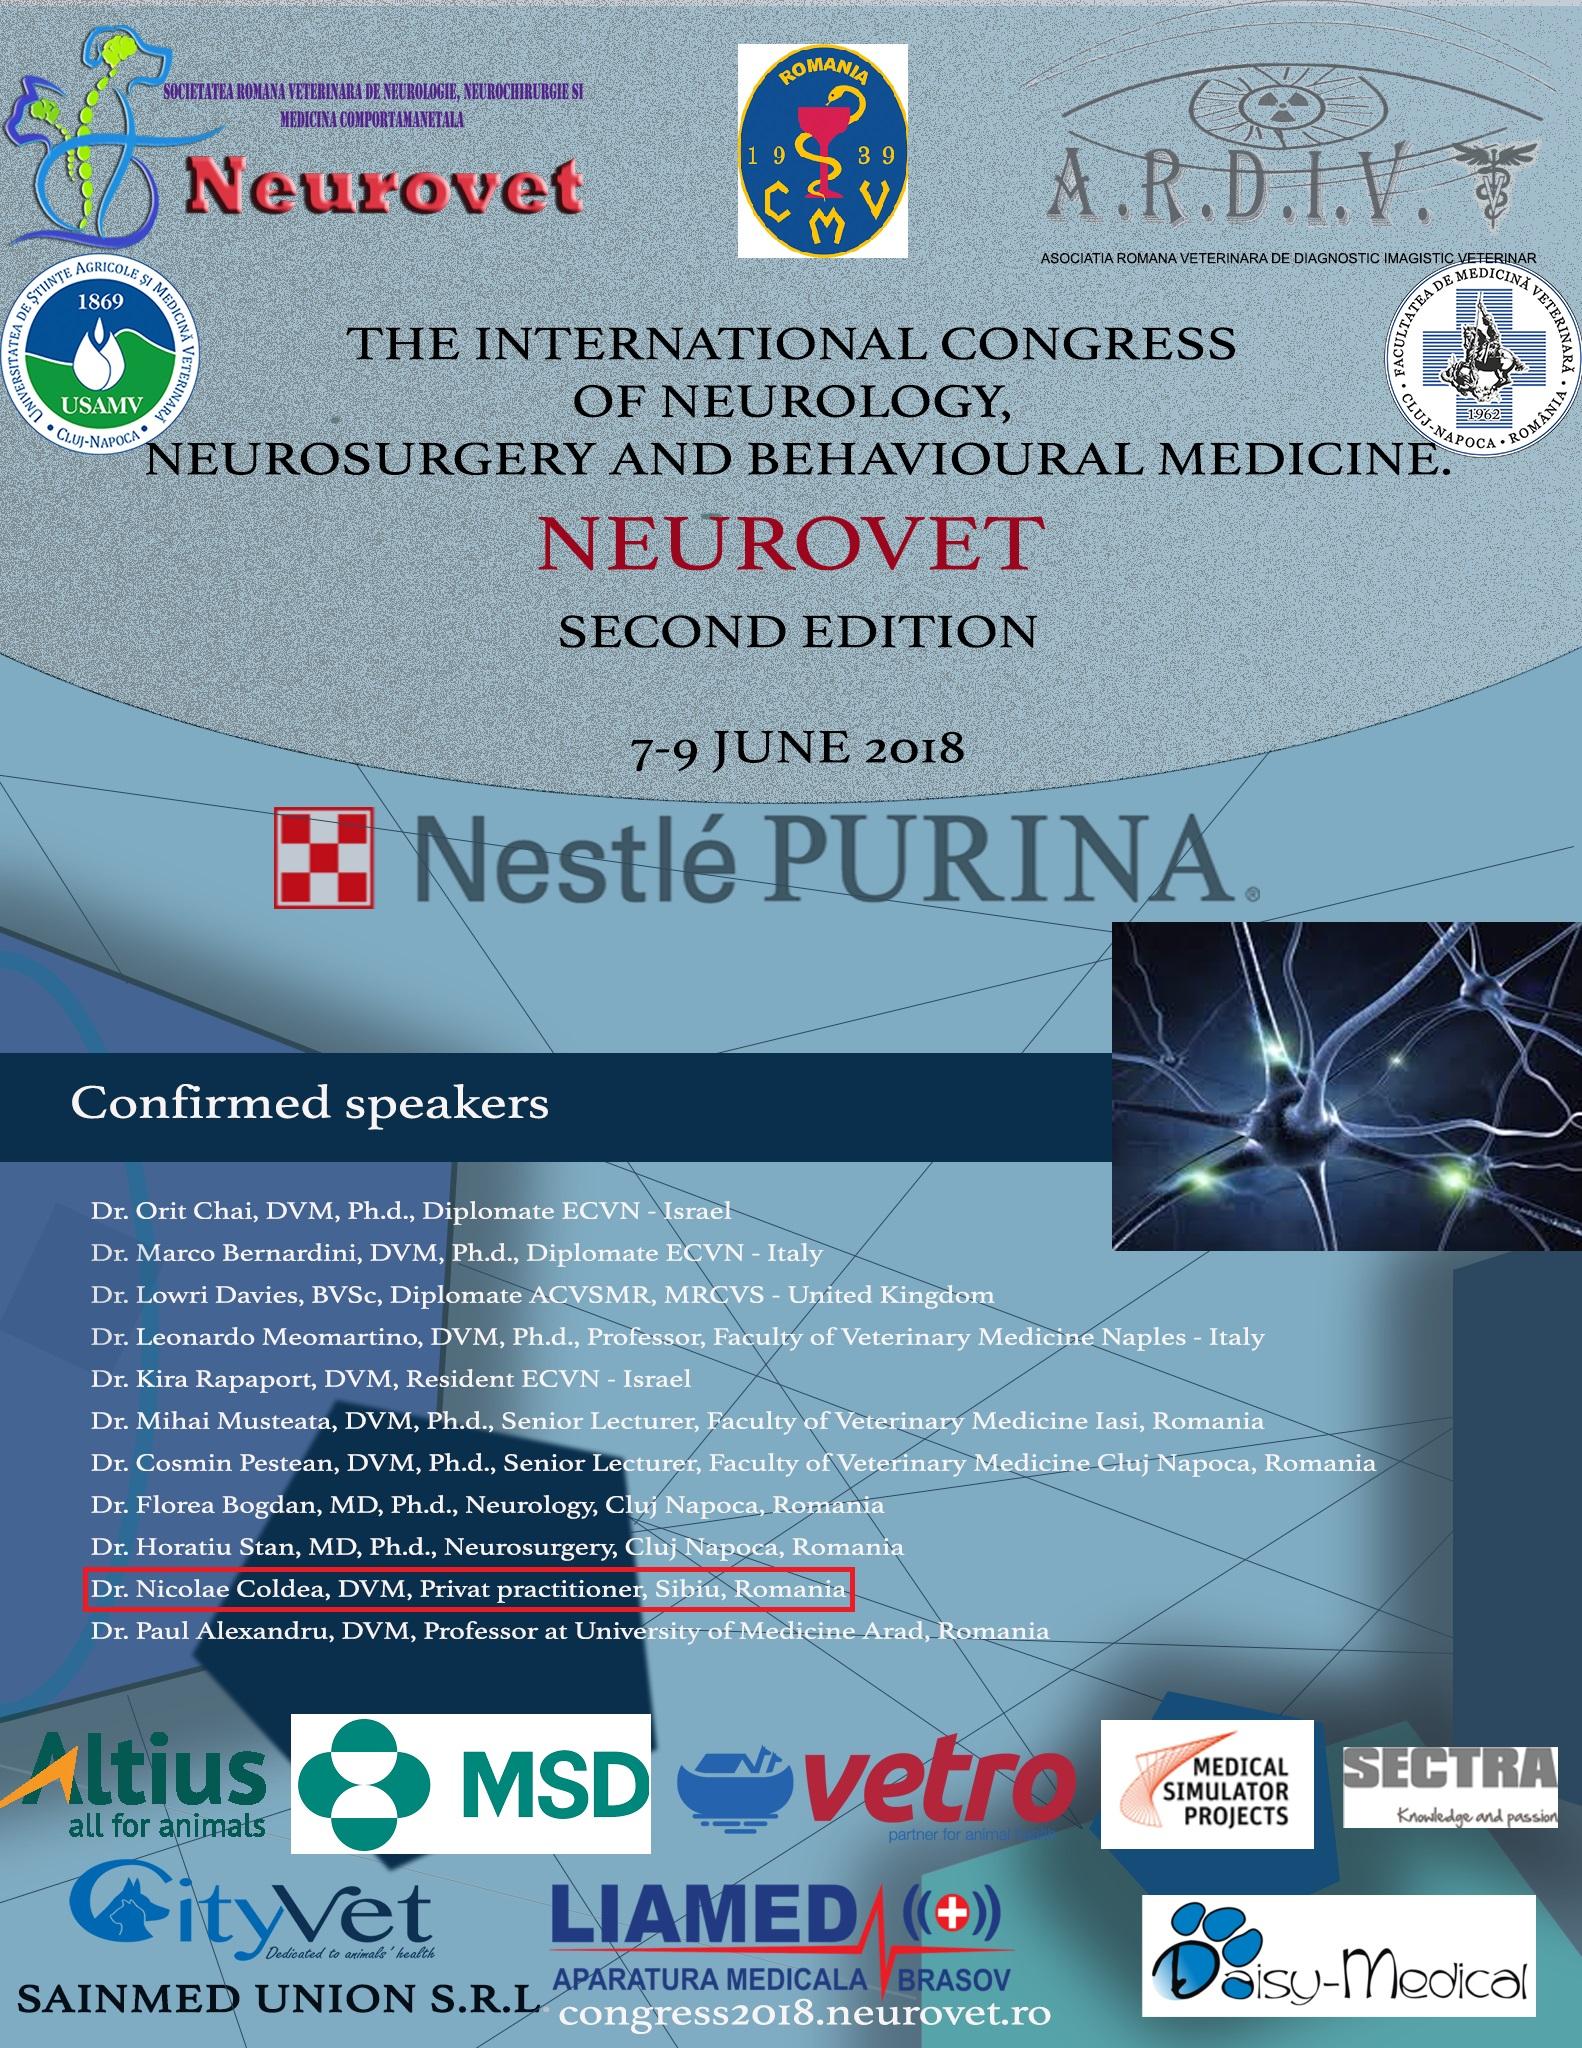 www.neurovet.ro